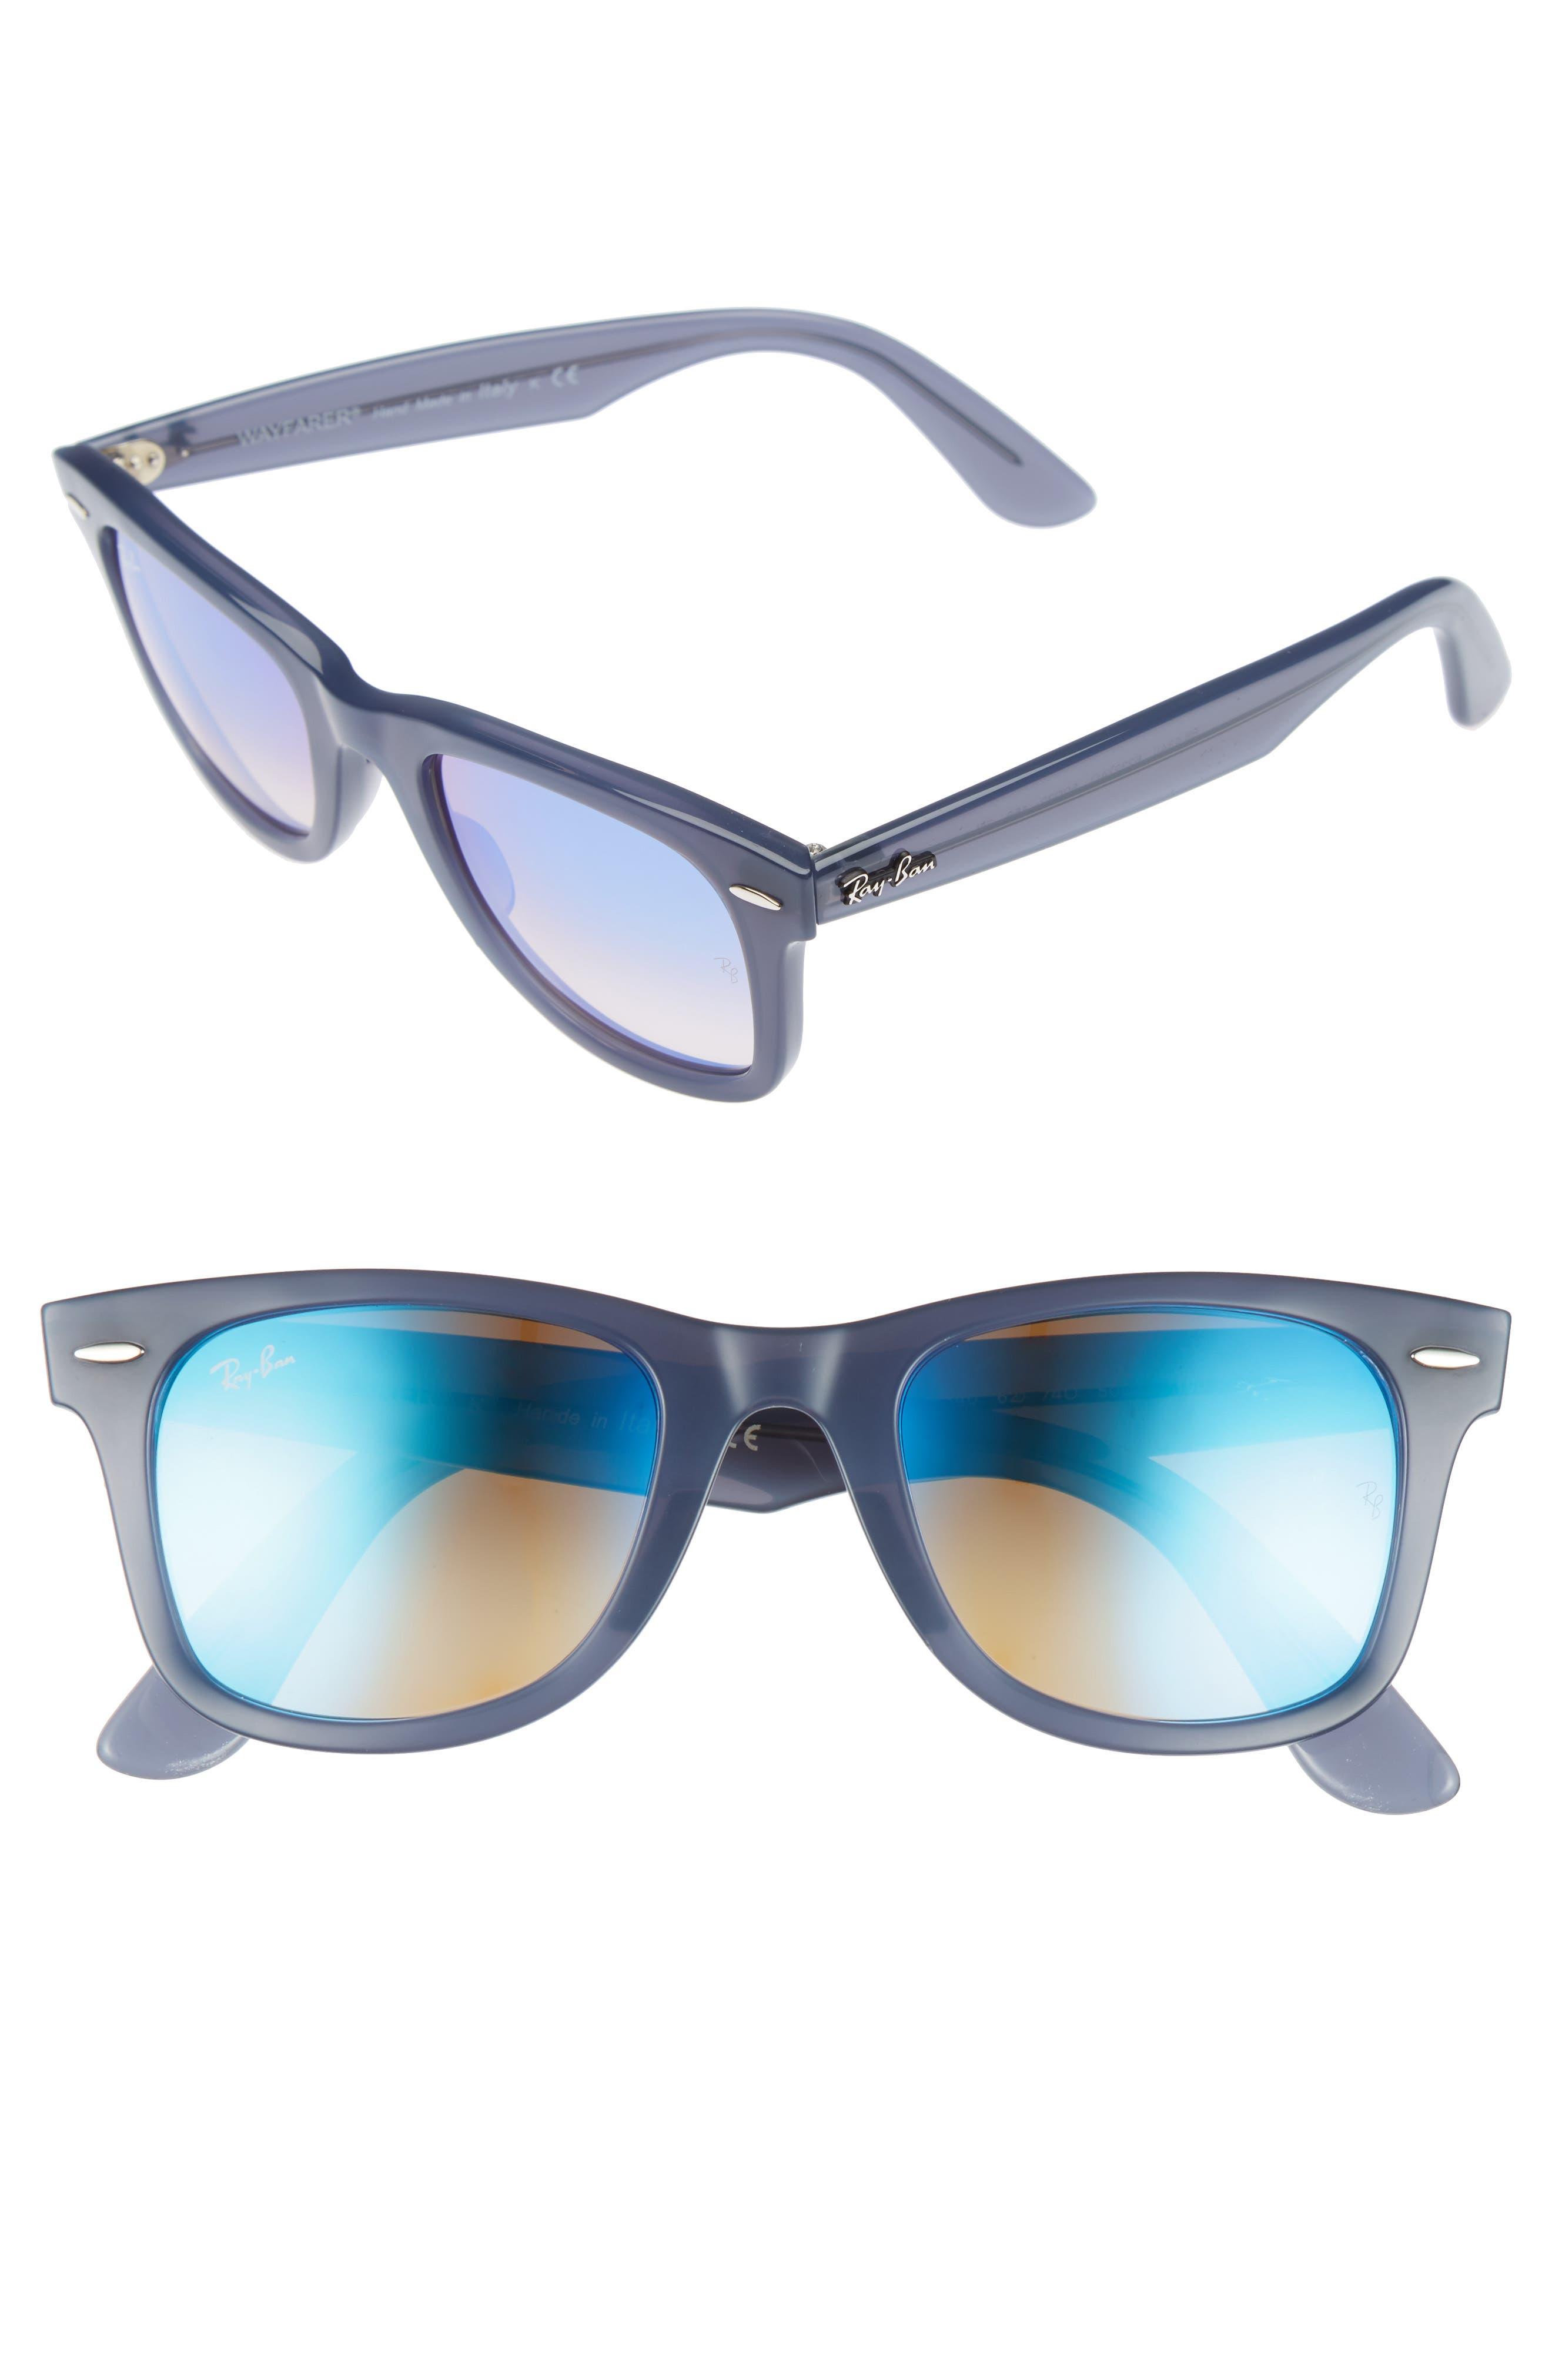 Ray-Ban 50mm Wayfarer Ease Gradient Mirrored Sunglasses